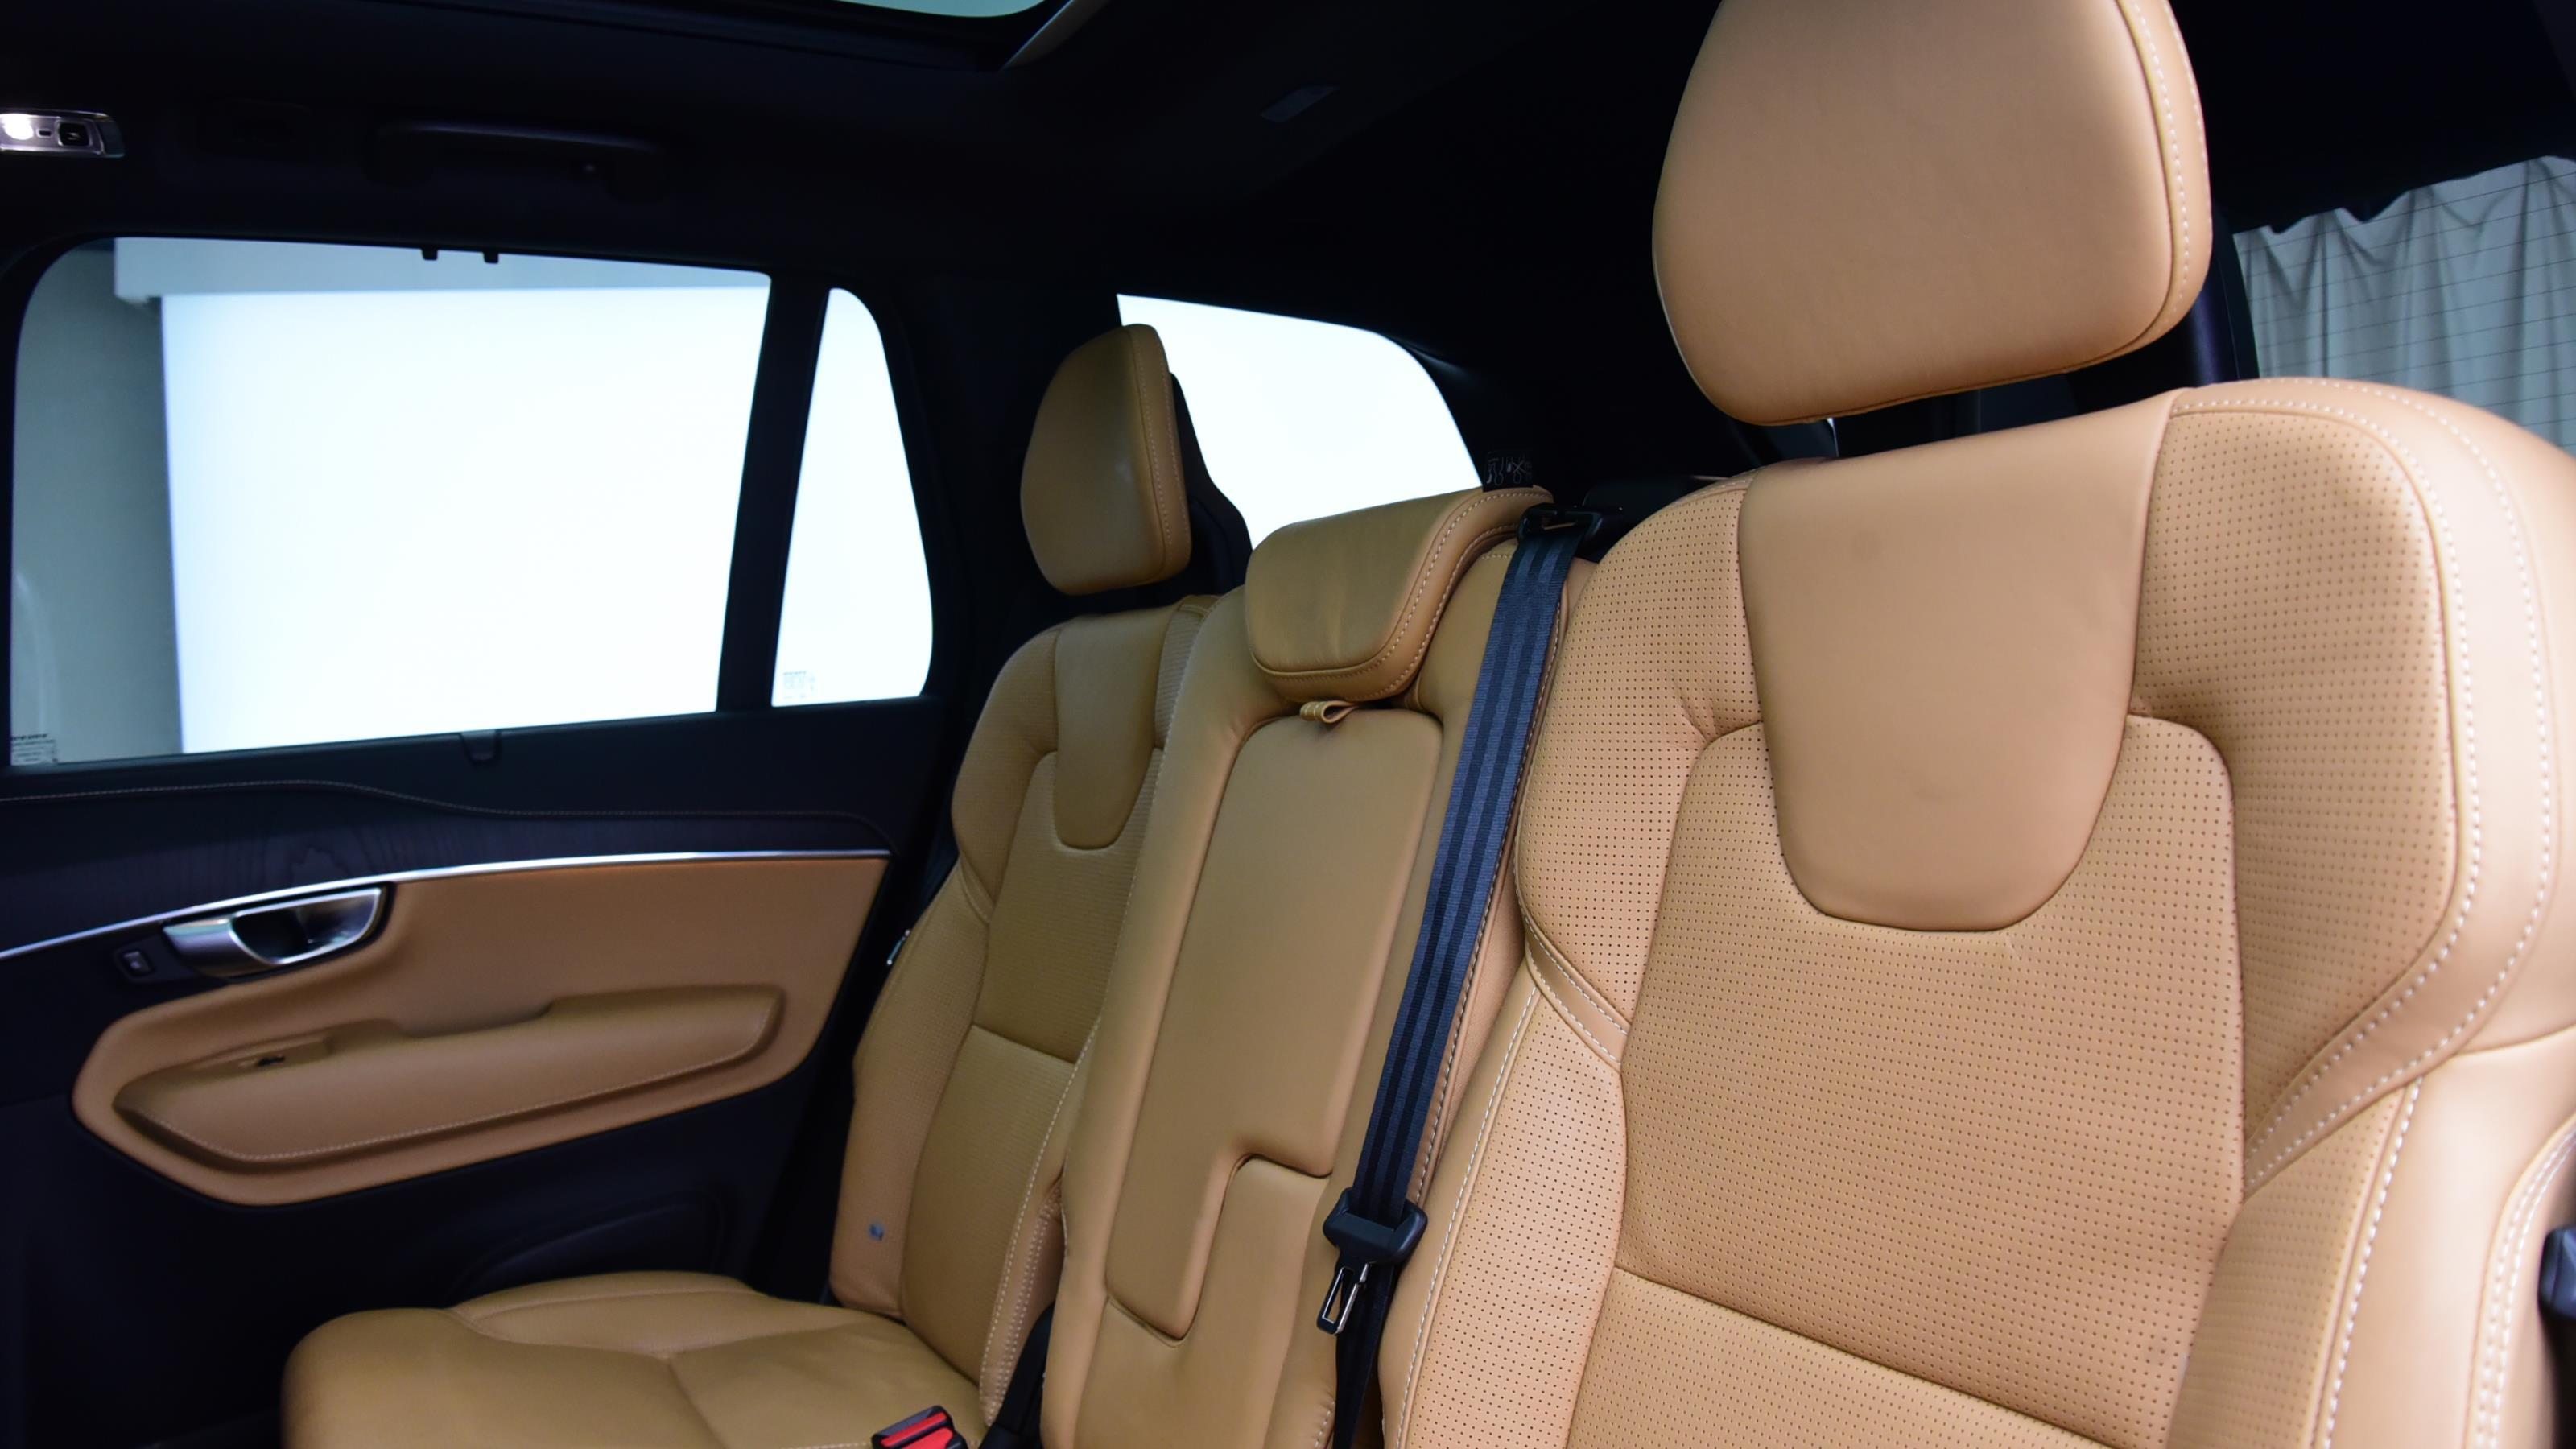 Used 2019 Volvo XC90 2.0 T8 [390] Hybrid Inscription Pro 5dr AWD Gtron BLUE at Saxton4x4